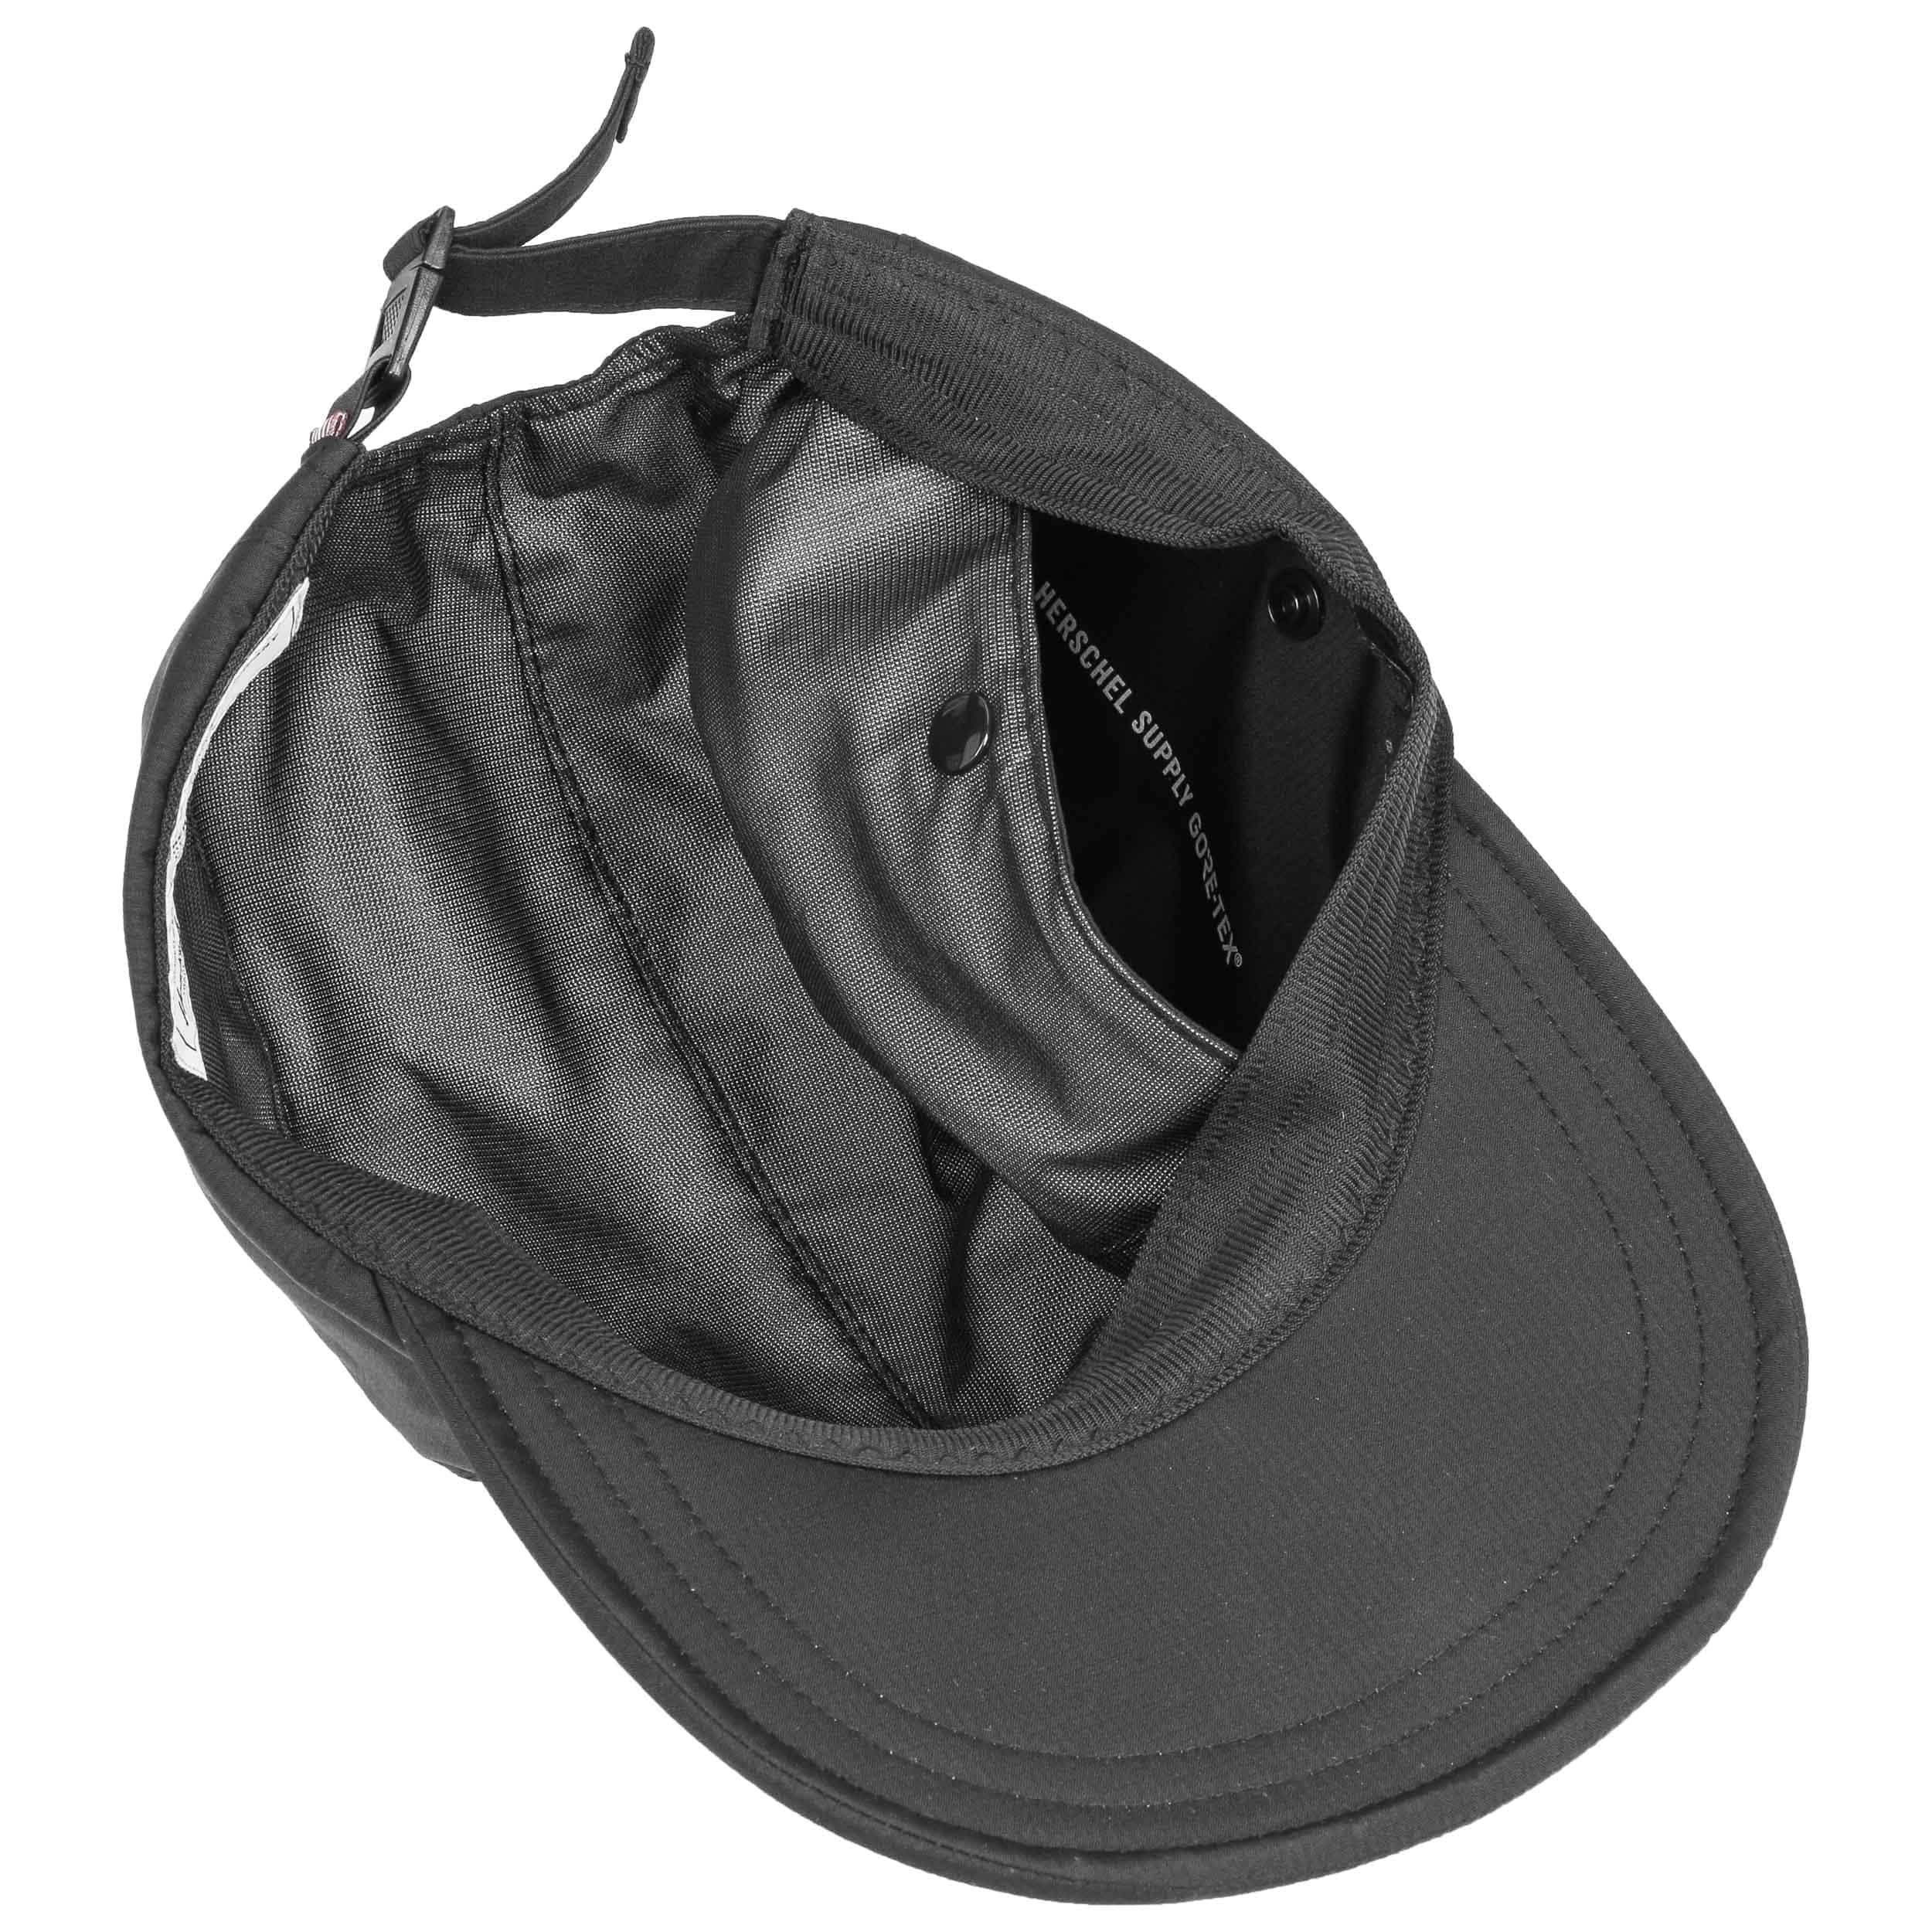 ... Glendale Gore-Tex Cap by Herschel - black 5 ... 4c55cc35856b